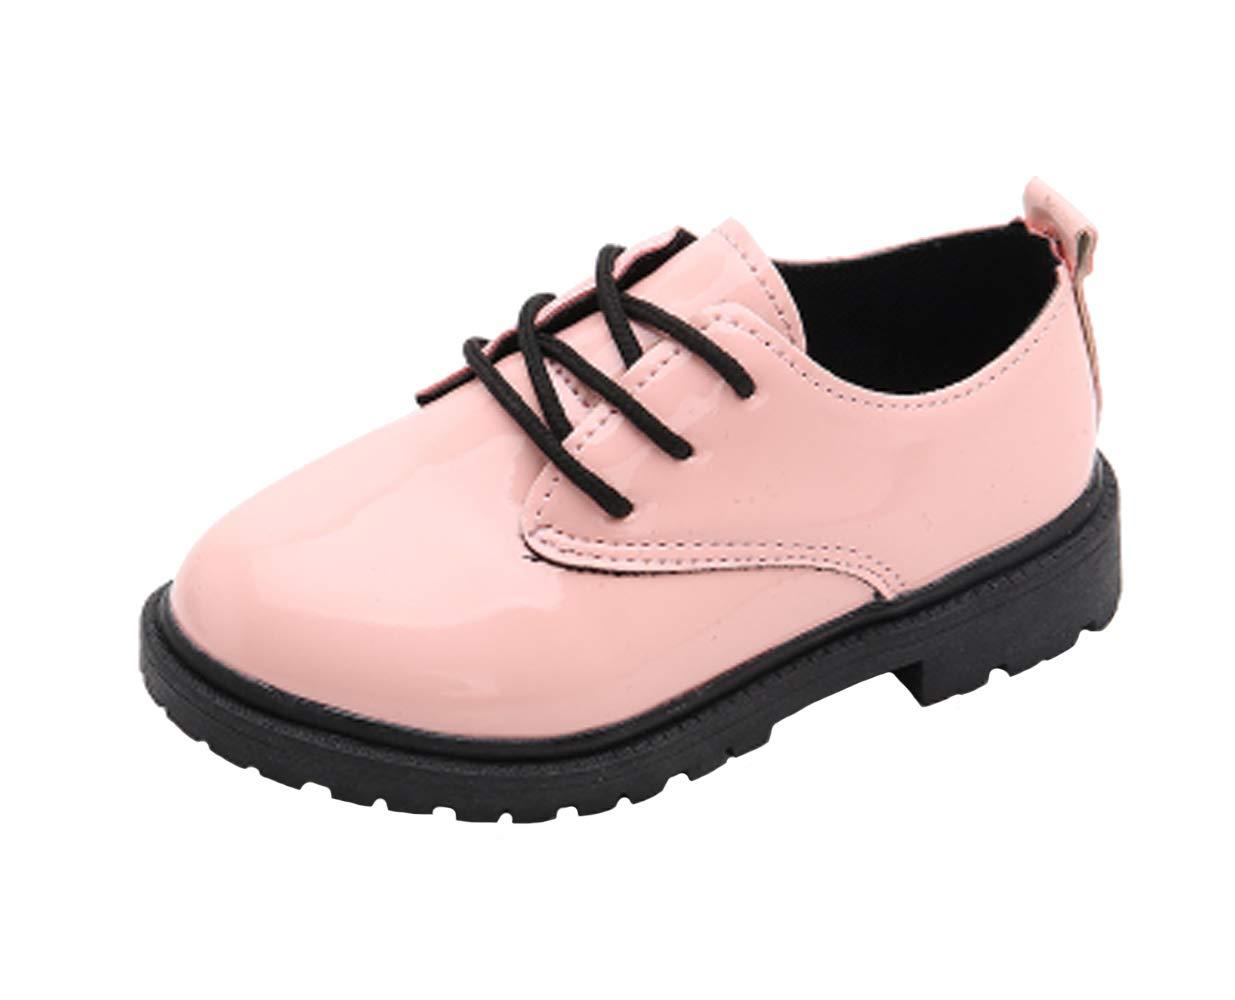 WUIWUIYU Boys Girls Lace-up School Uniform Dress Oxfords Casual Shoes Pink Size 2 M